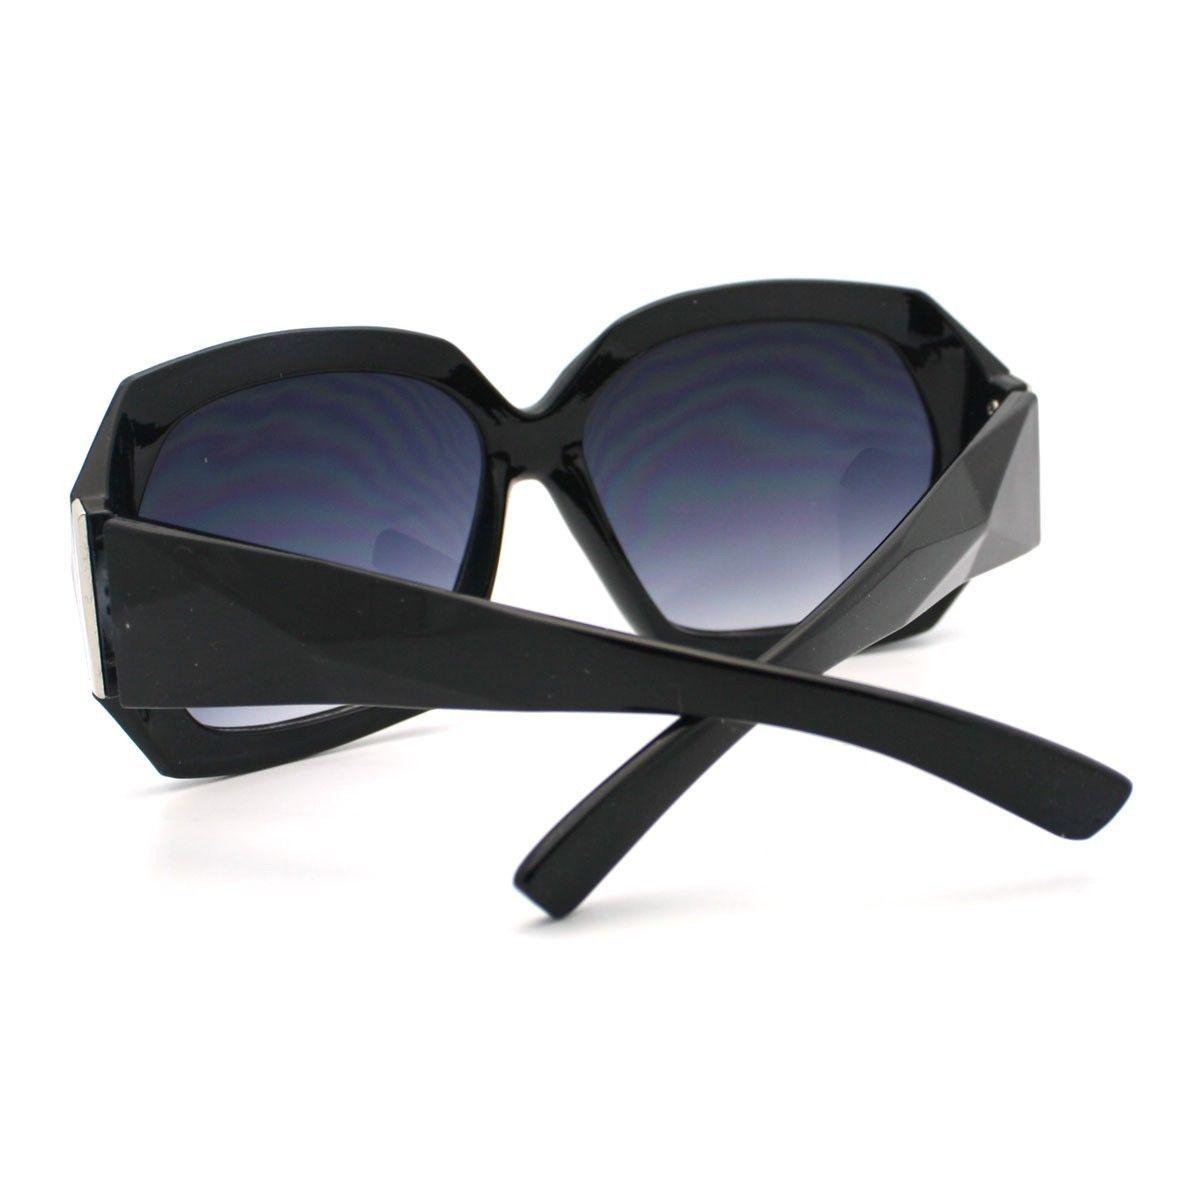 Diamond Cut Design Womens Sunglasses Oversize Square Fashion Frame BLACK